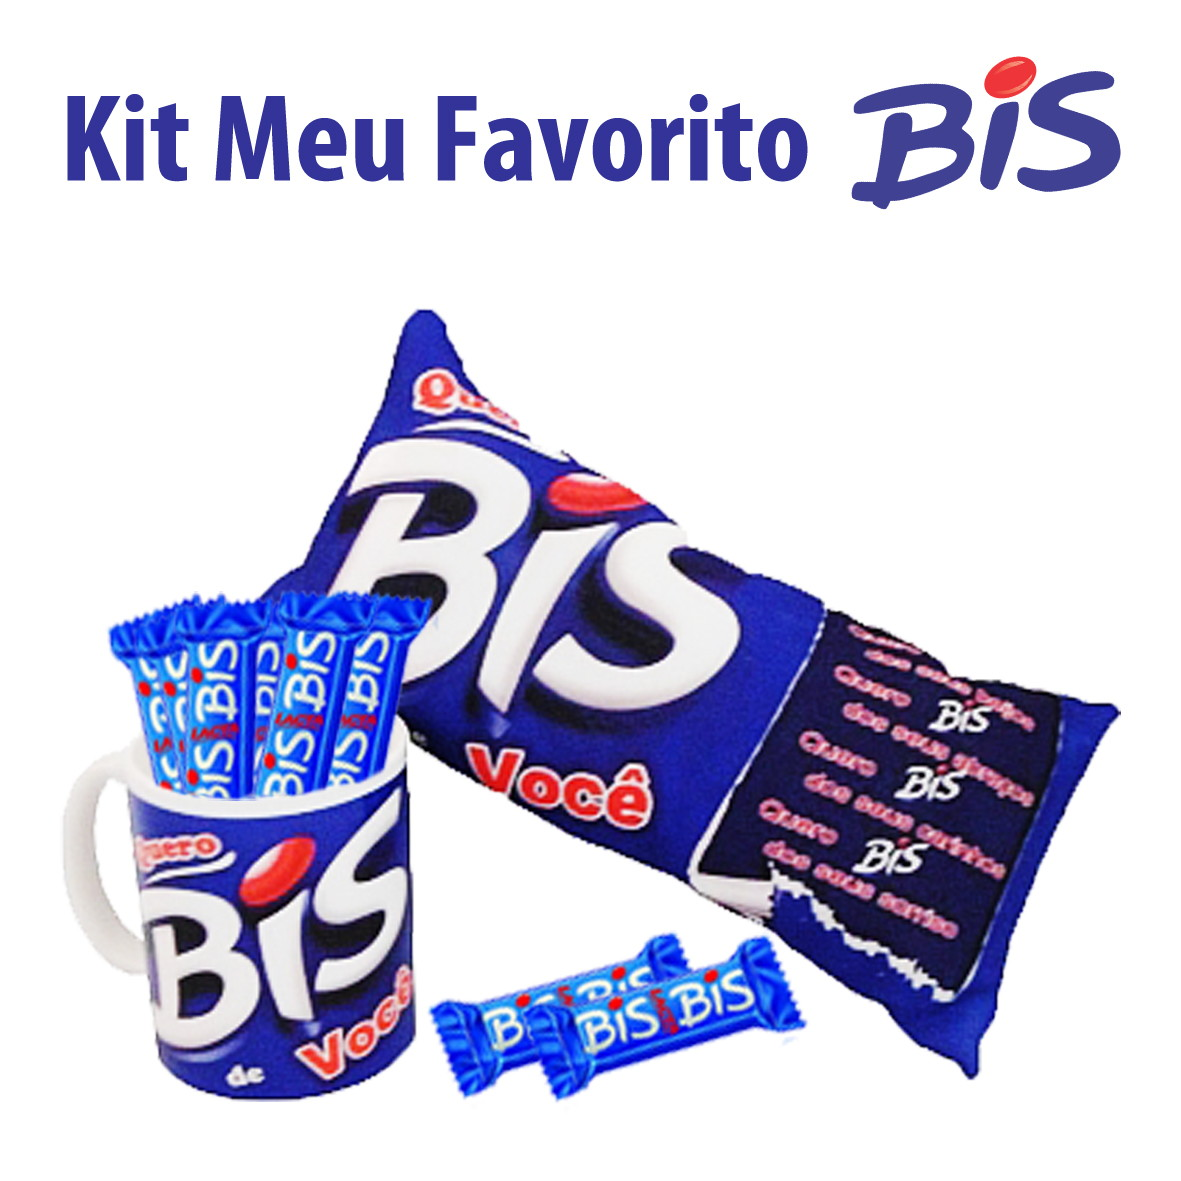 3c802c00fc4 Kit Meu Favorito Baton ou Bis Personalizada no Elo7